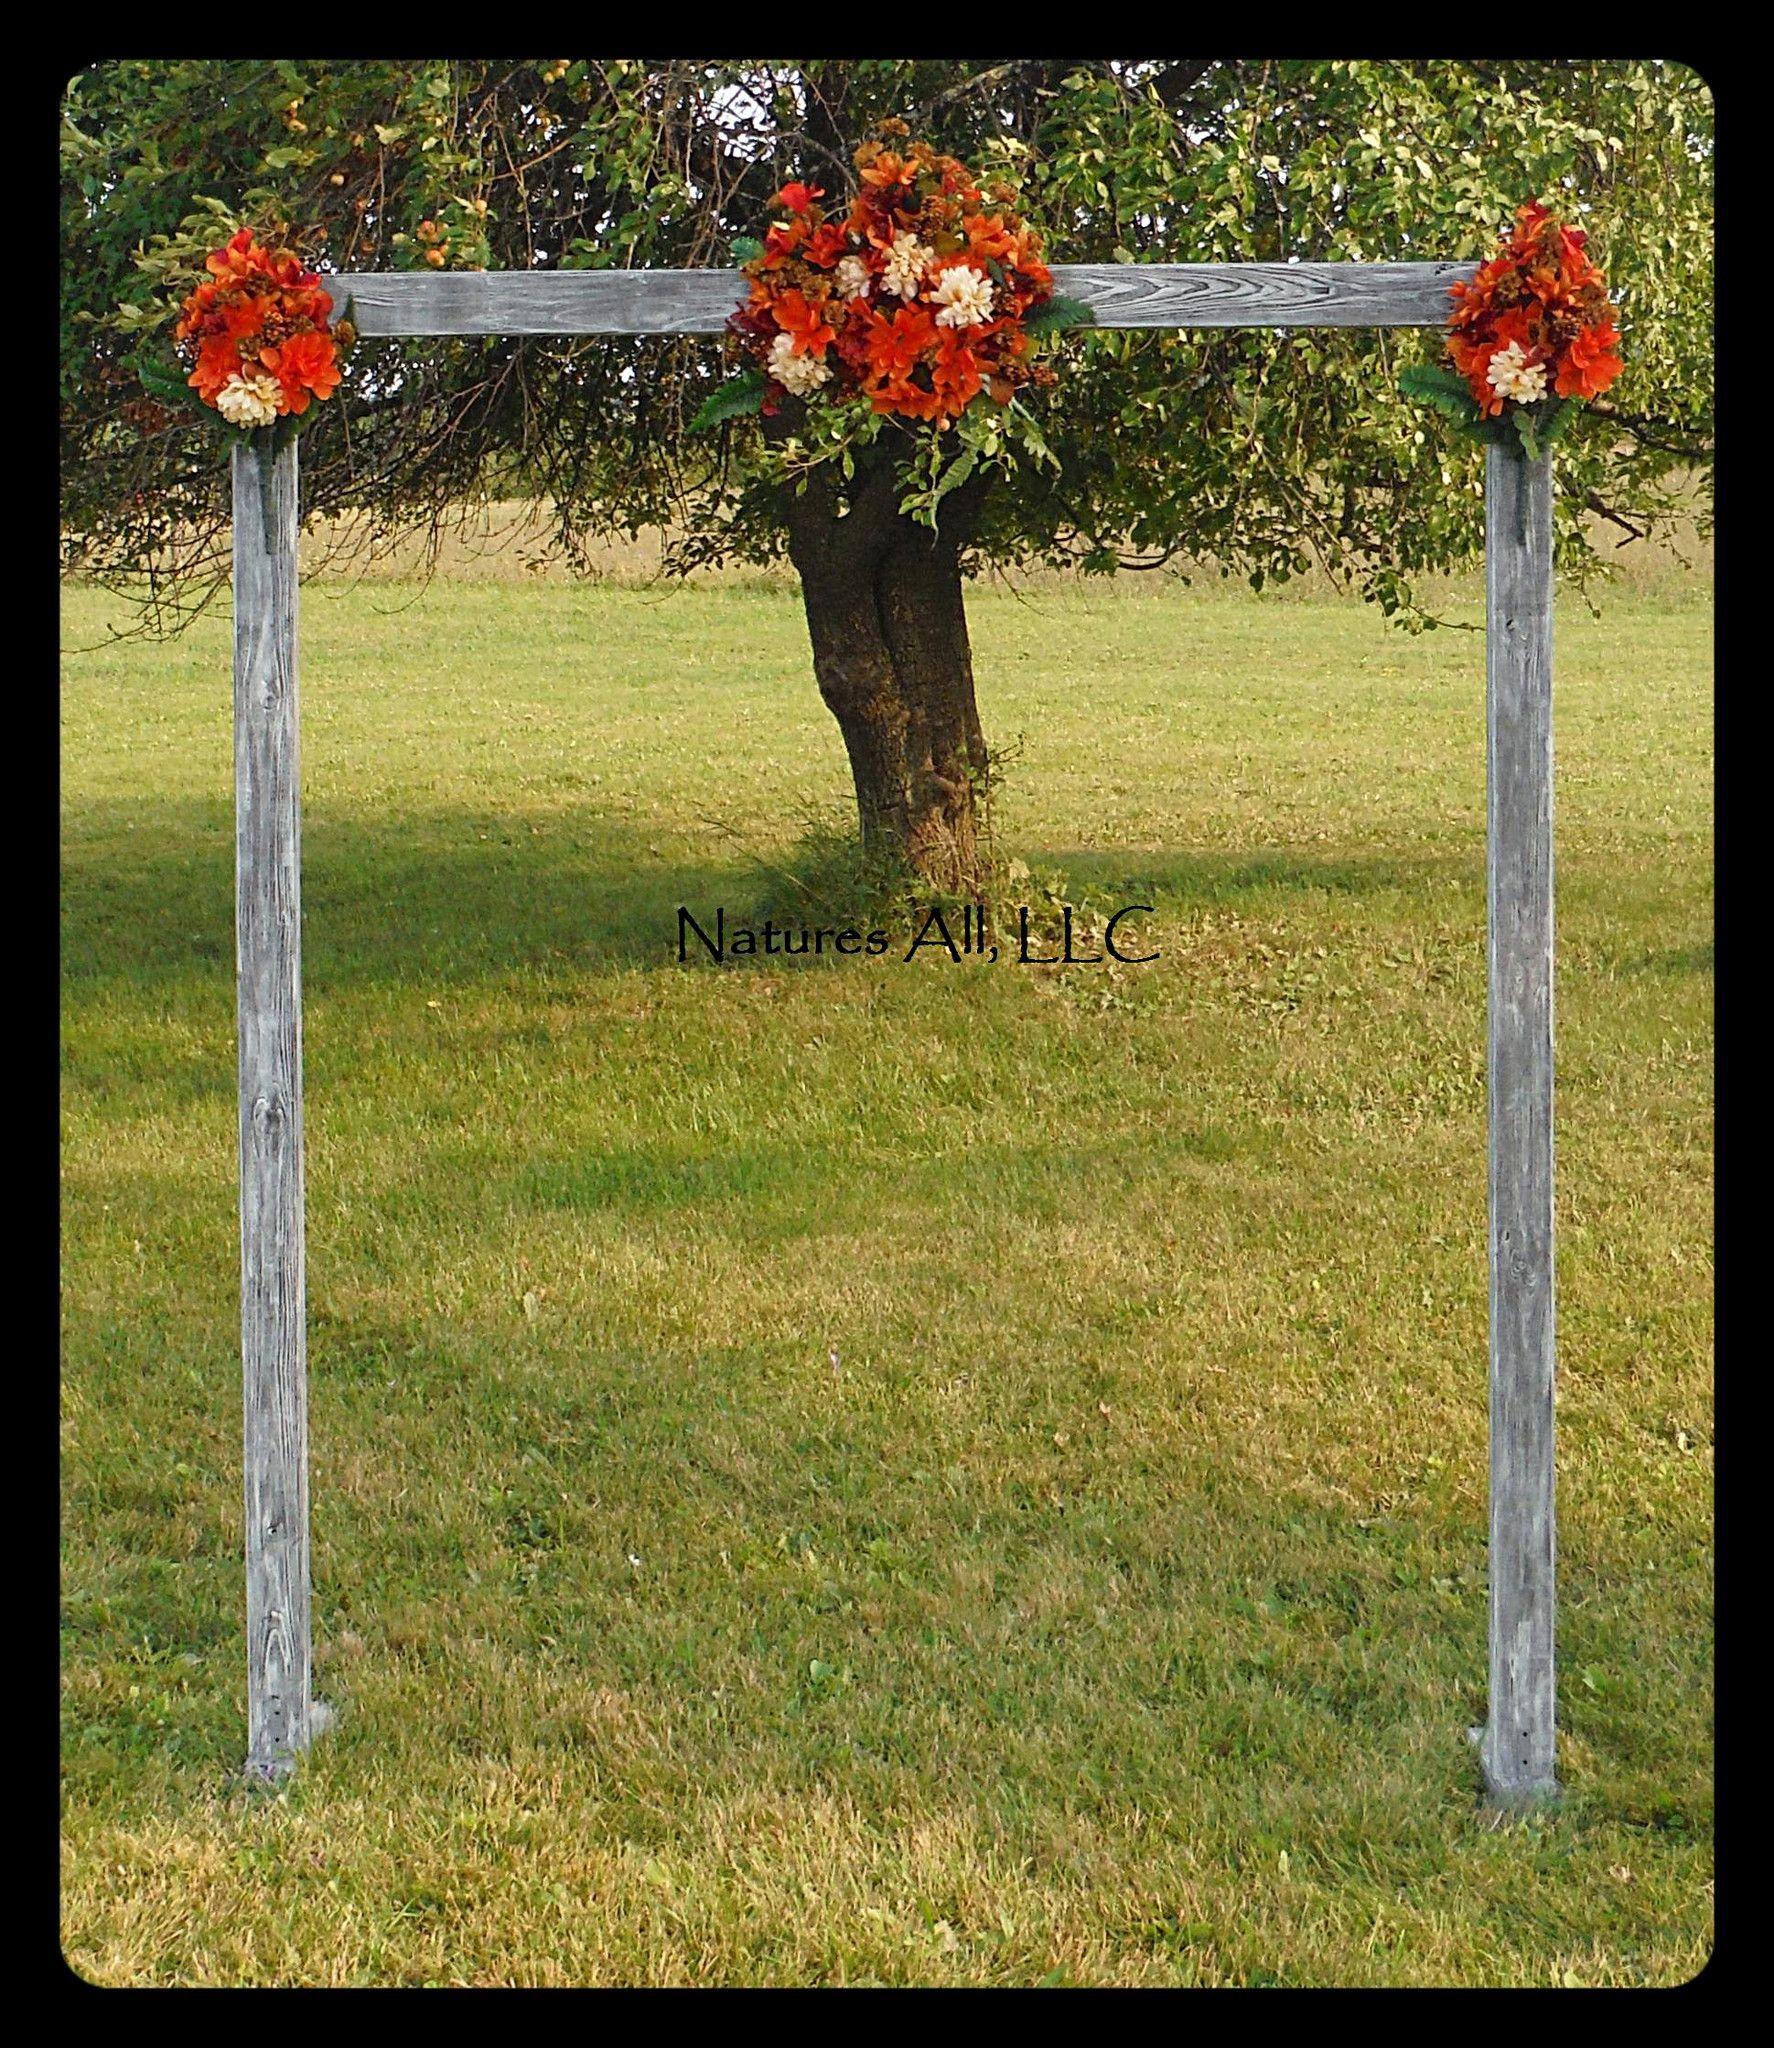 Camo Outdoor Wedding Ideas: DIY Wedding Arch/Country Wedding Decor/Rustic Wedding Arch